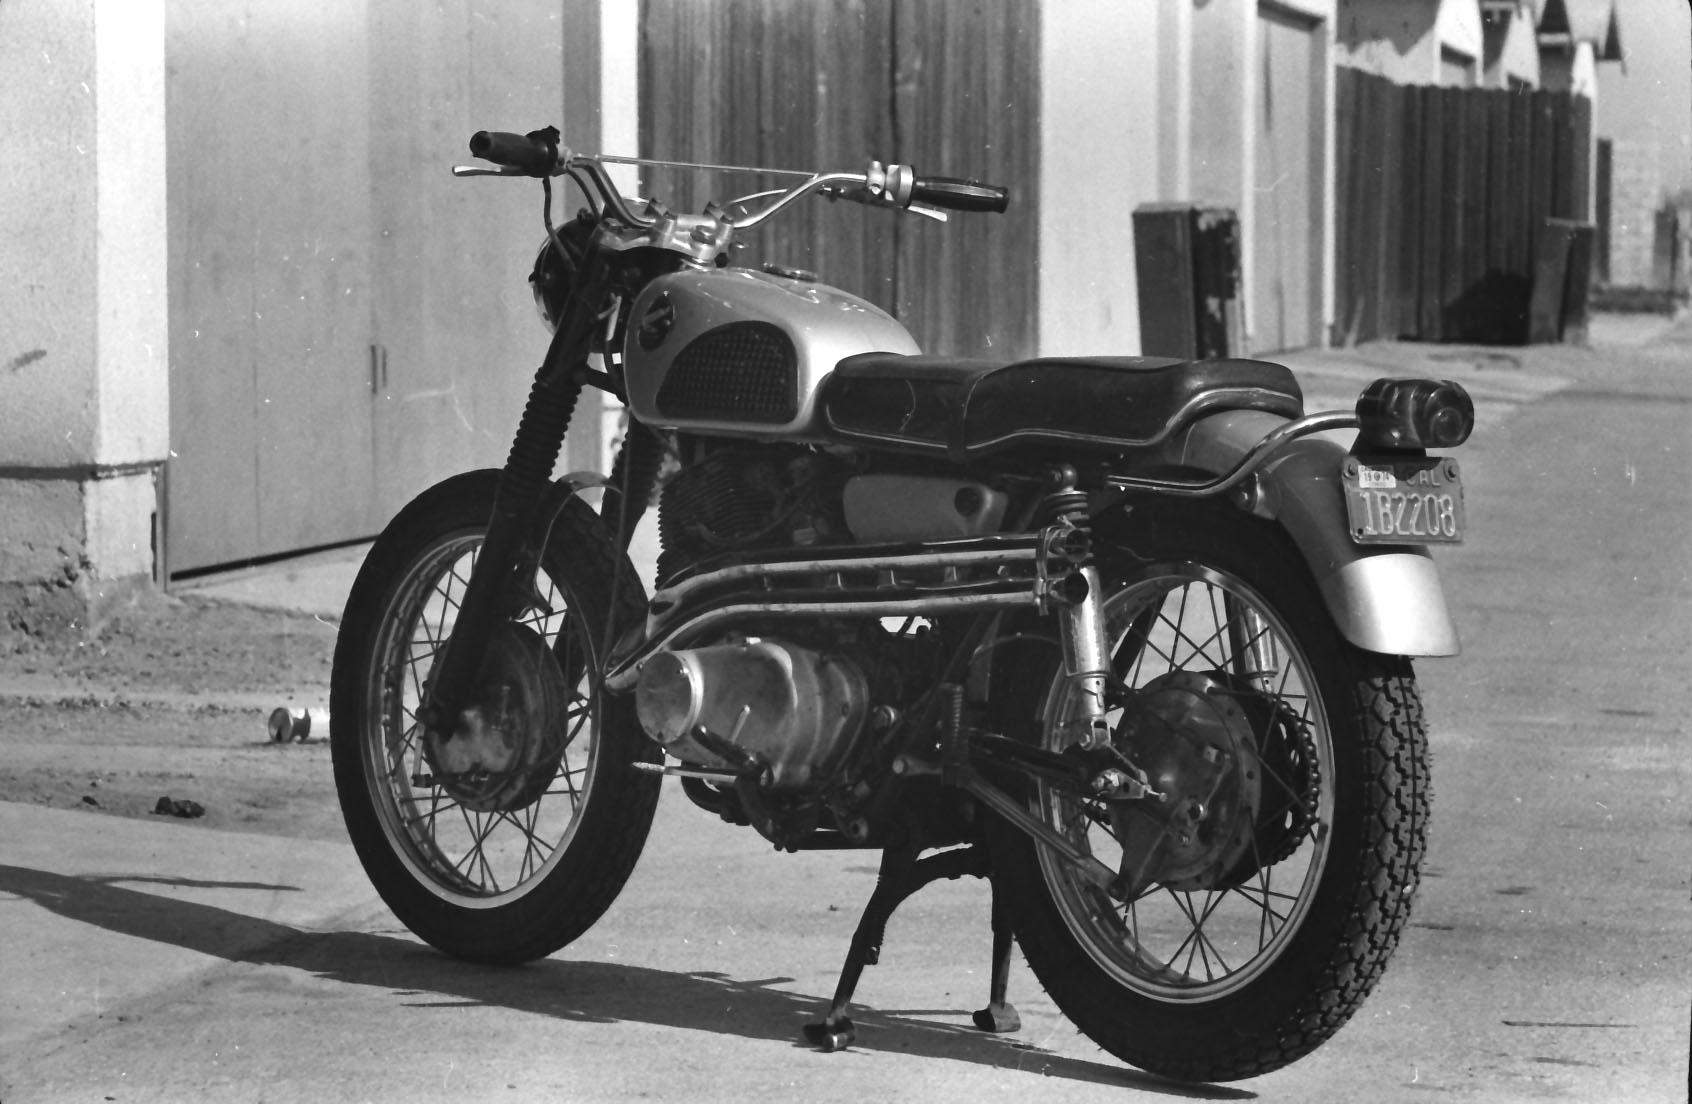 1966 Honda 305 Scrambler Restoration